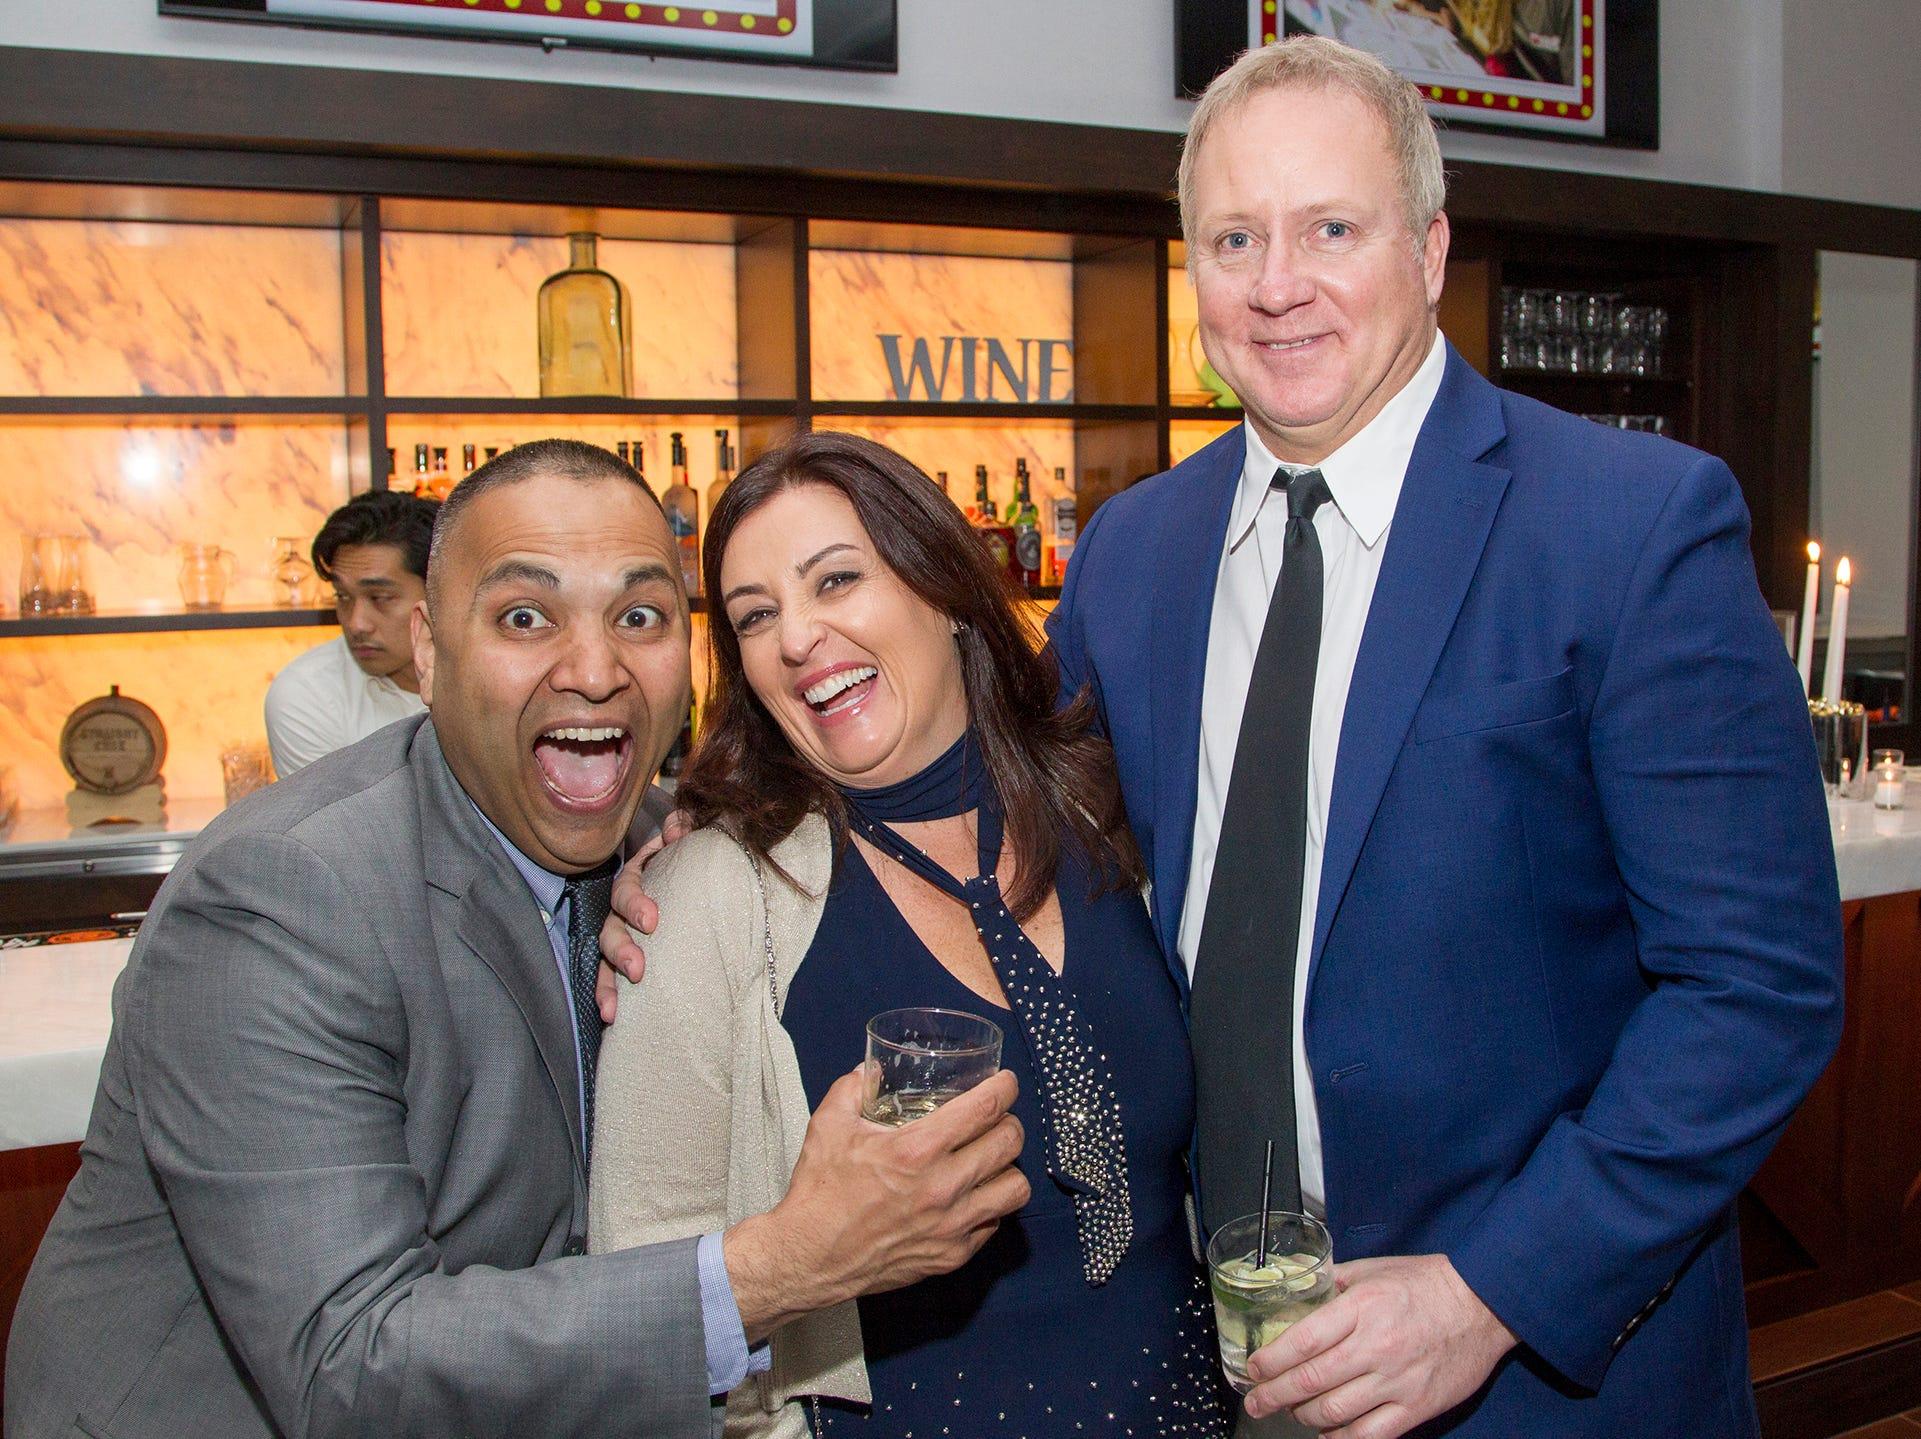 Niles Patel, Anastasia Kelly, Chris Taughran. Saddle River Day Annual Gala at Alpine Country Club 04/13/2019